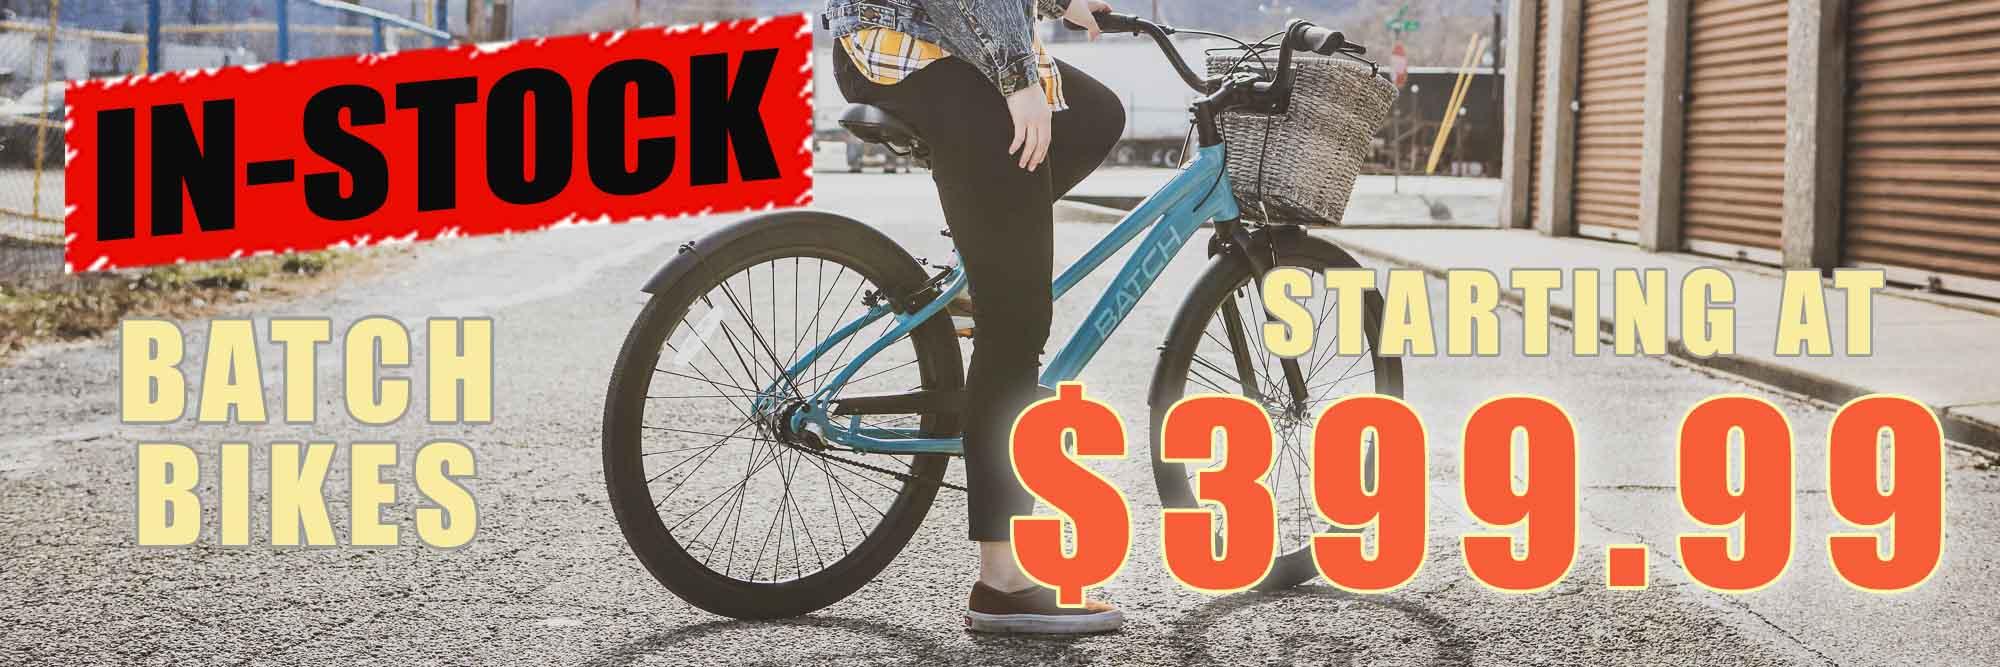 Batch Bikes in-stock Now